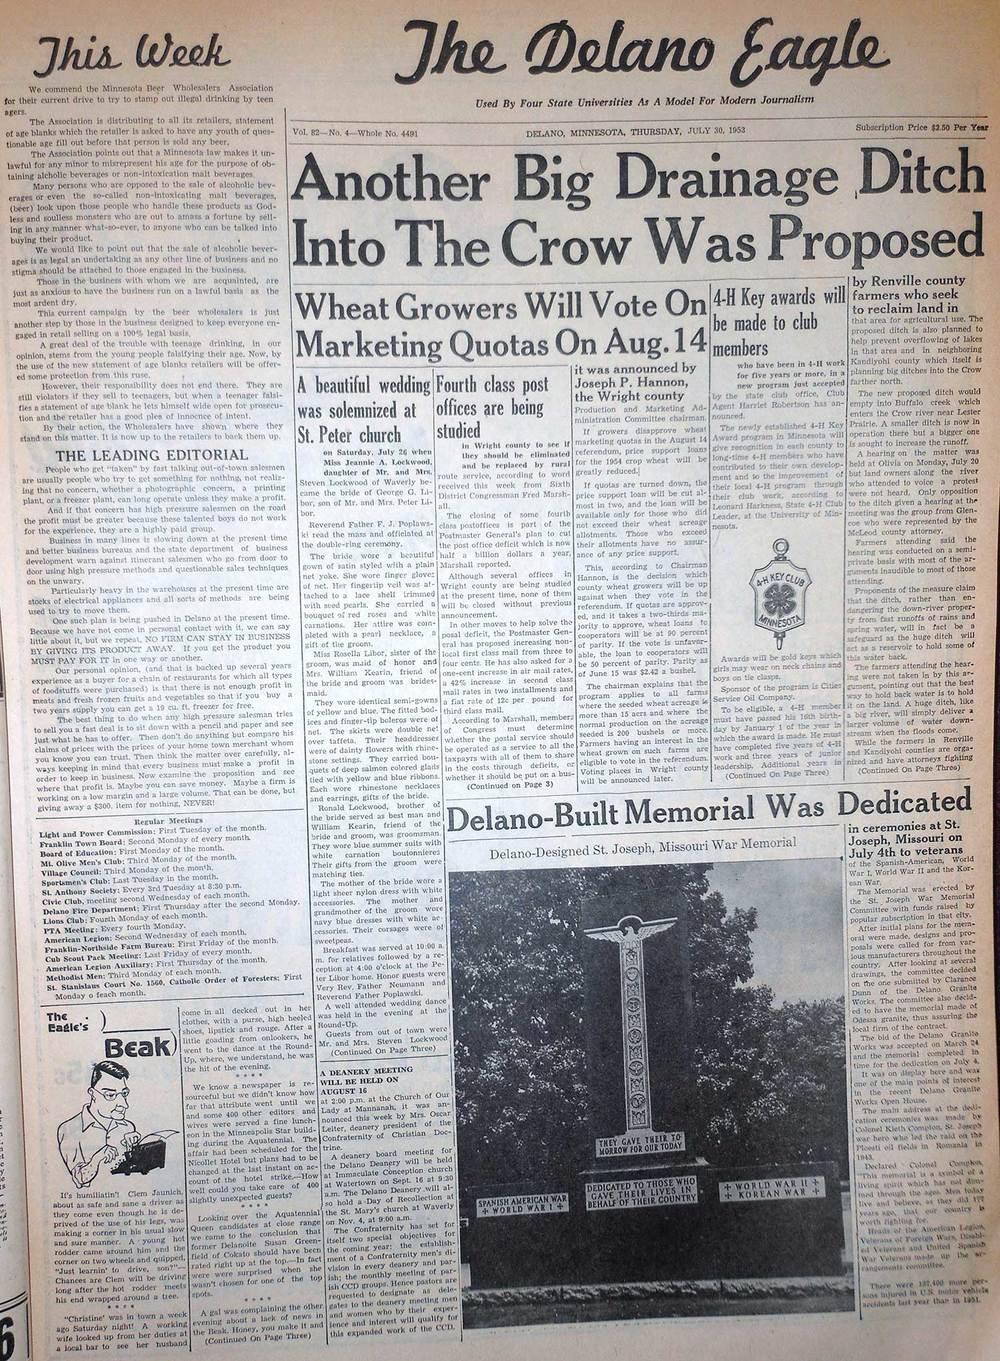 7/30/1953, p1